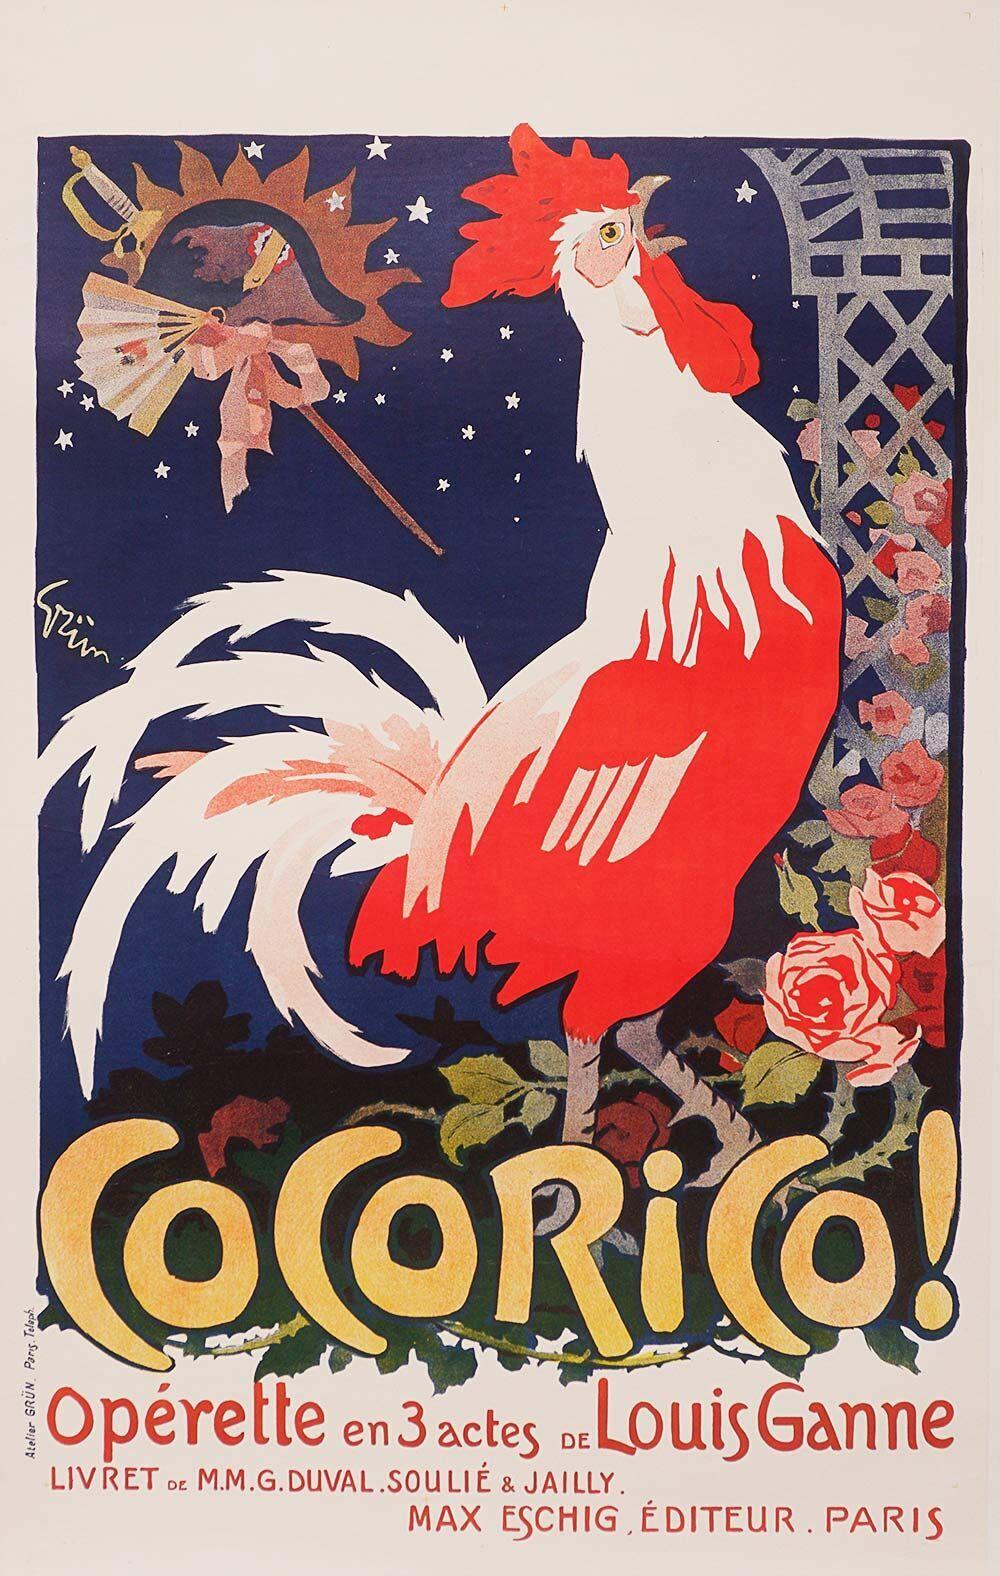 Original Cocorico Poster